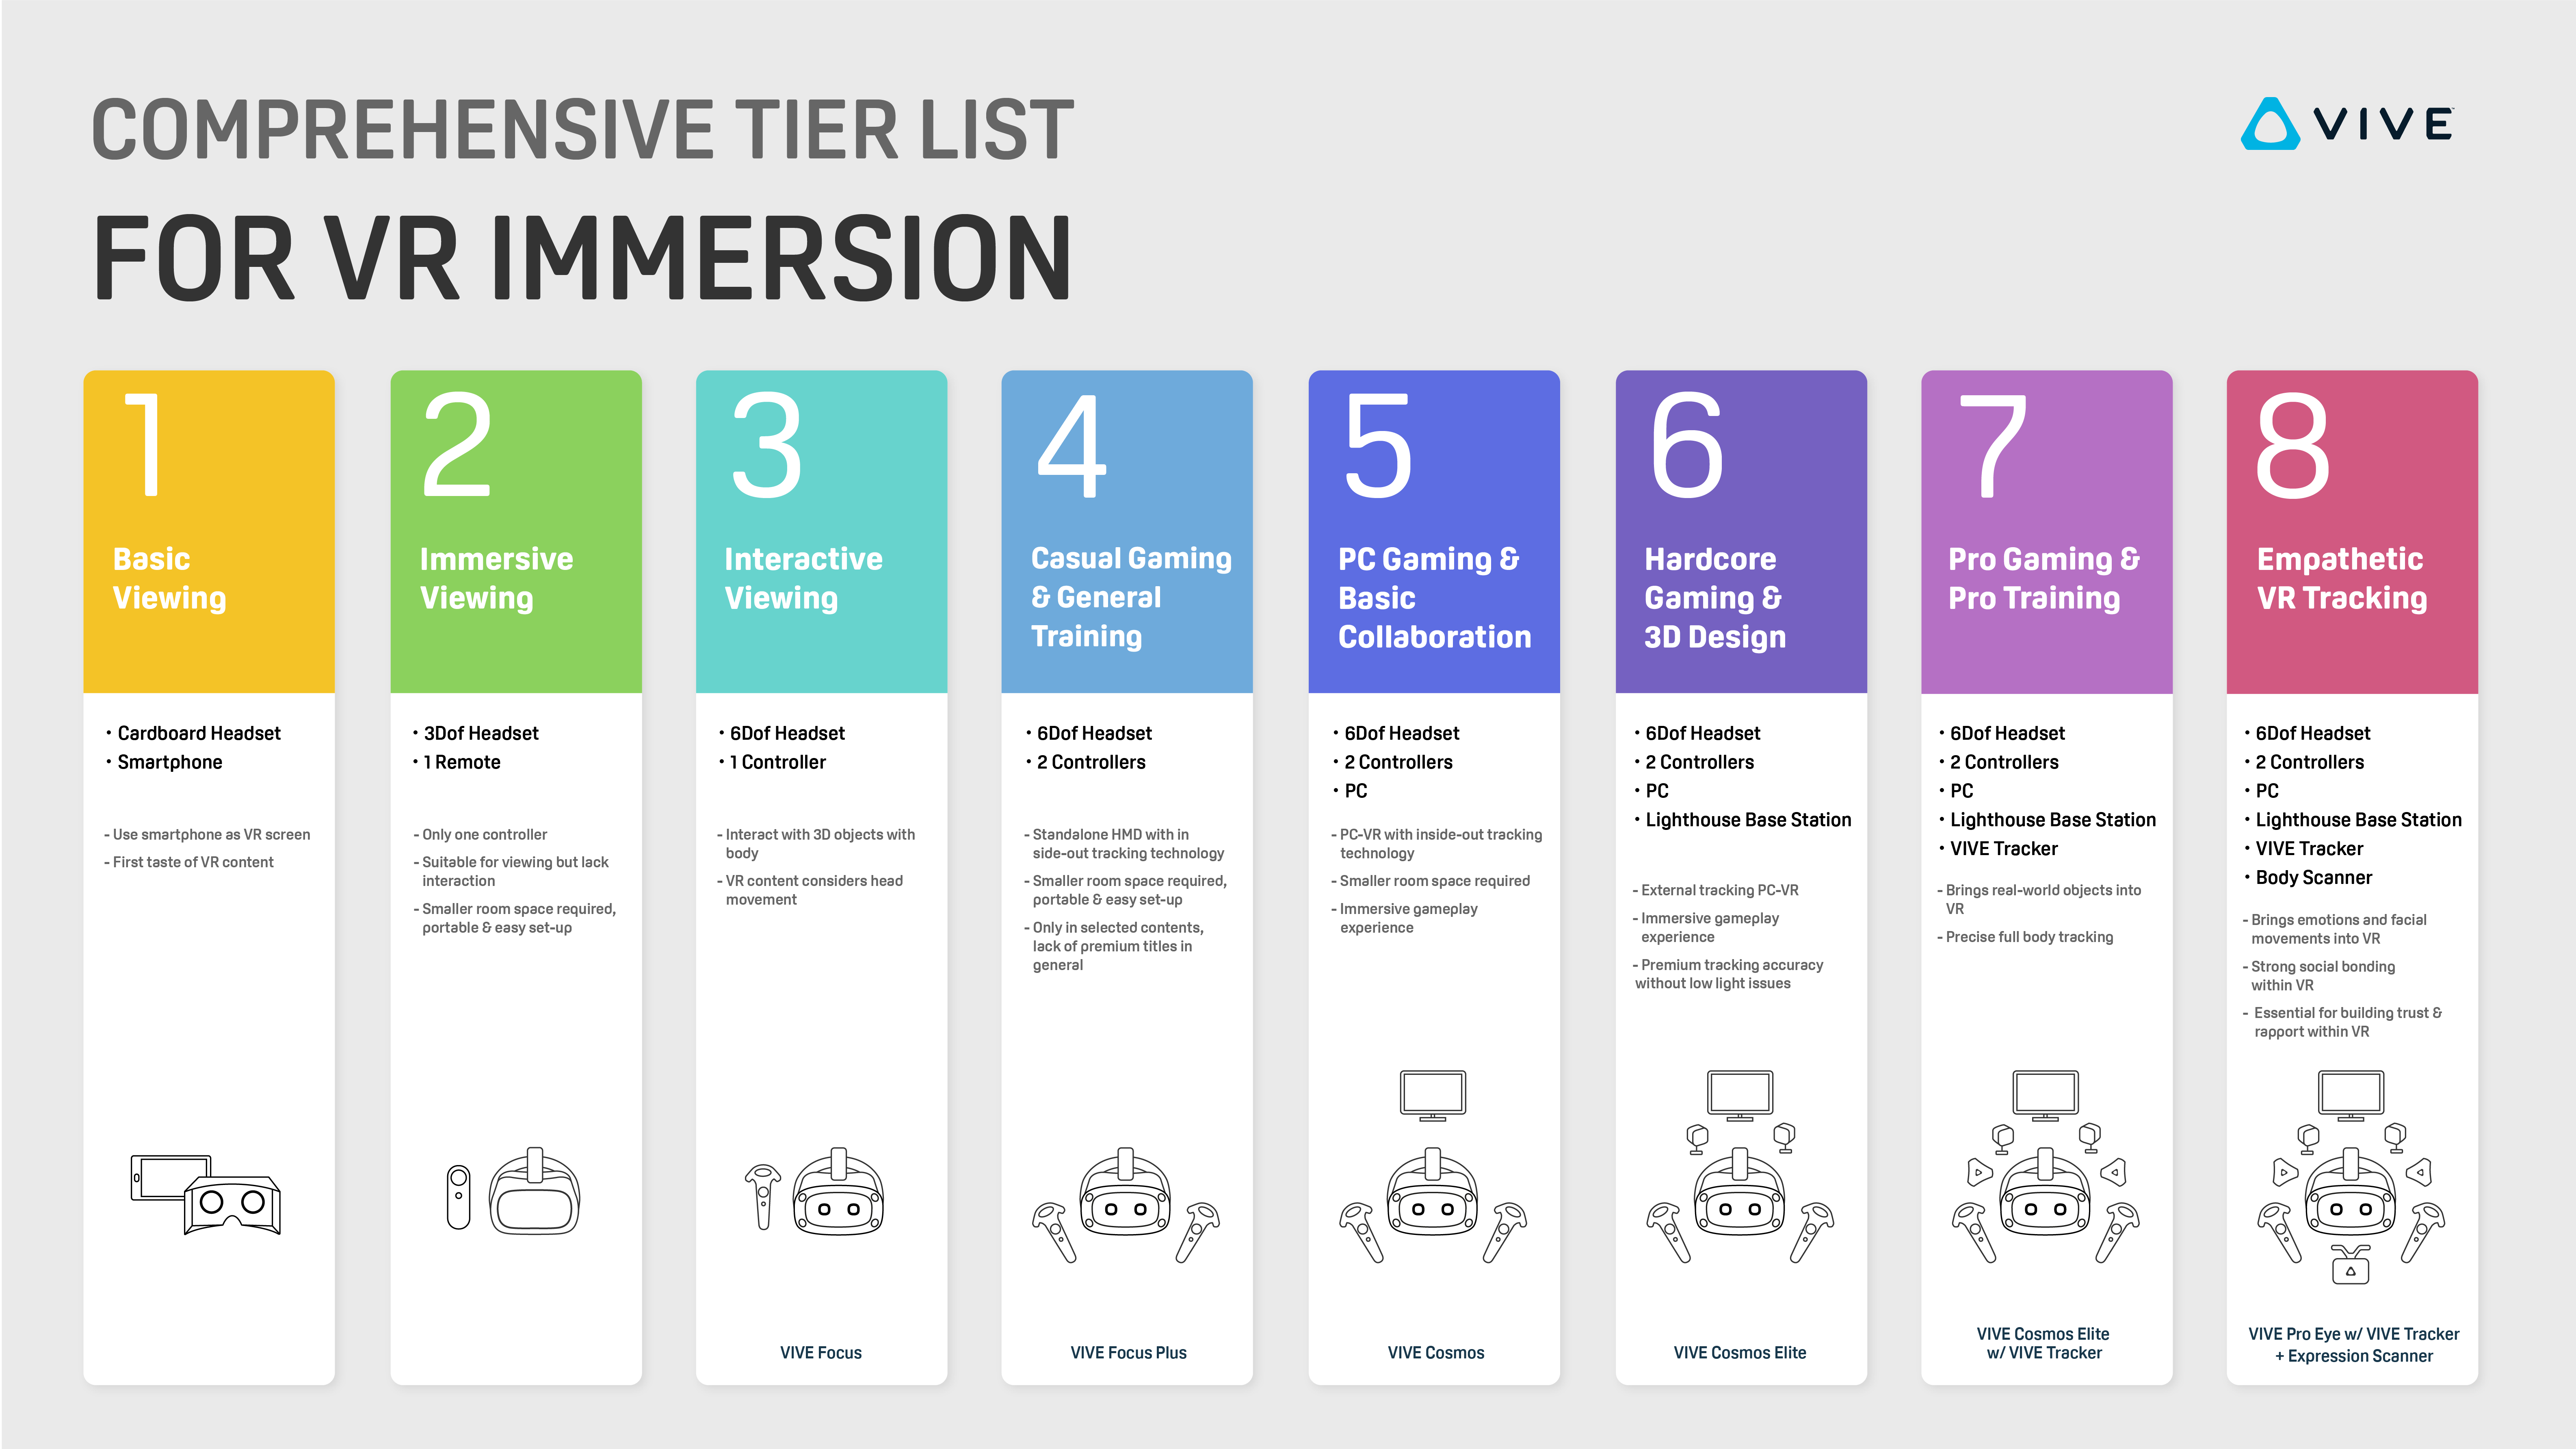 VR Tier List